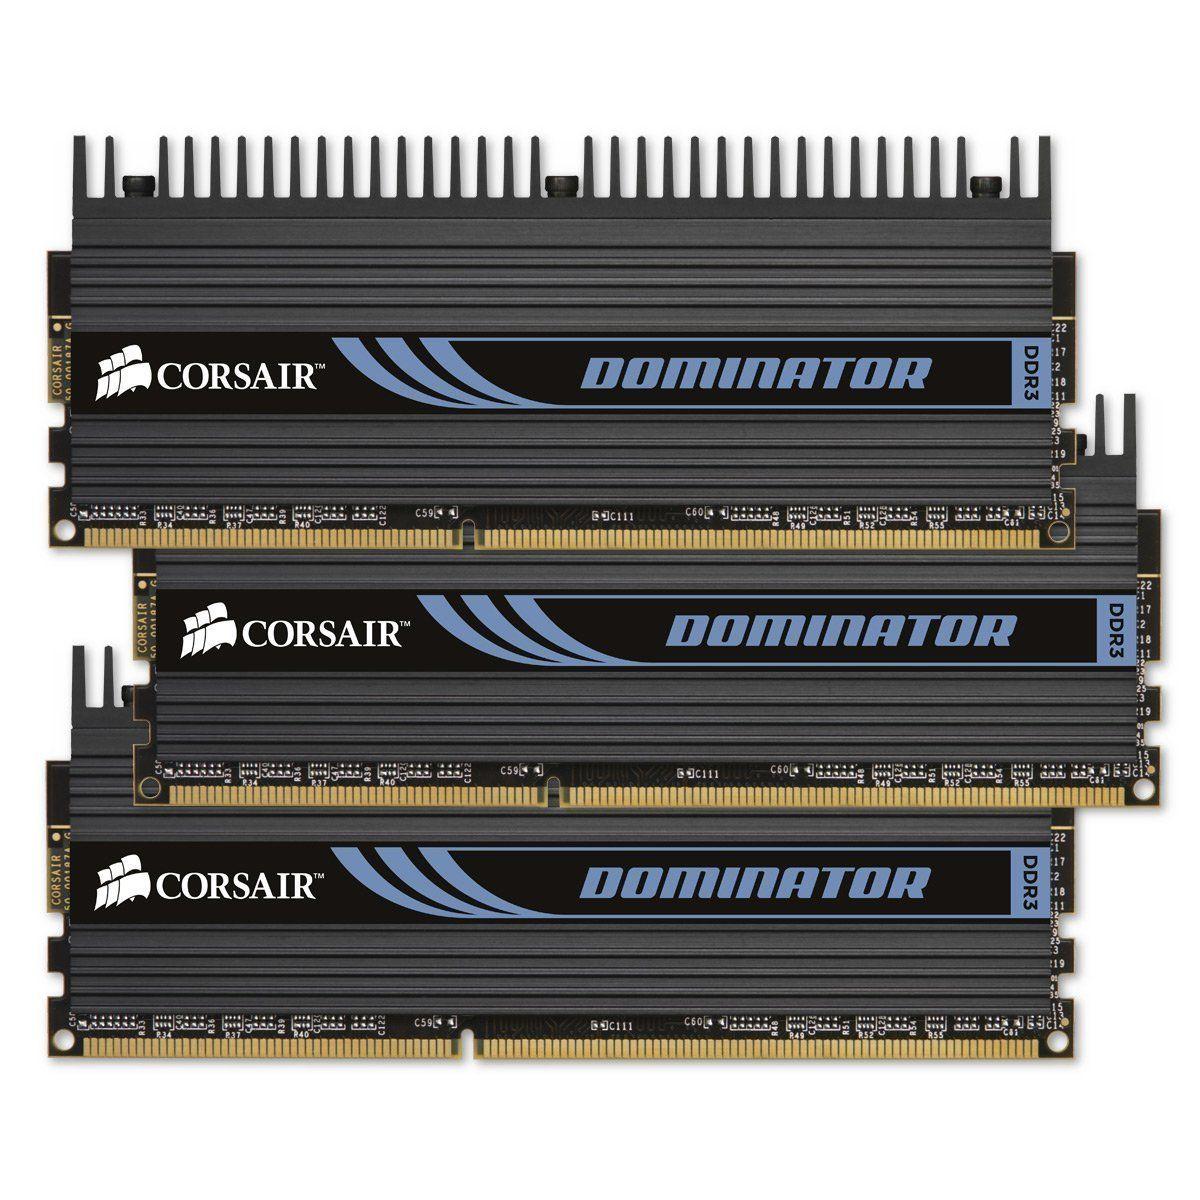 Corsair Dominator RAM-moduler.